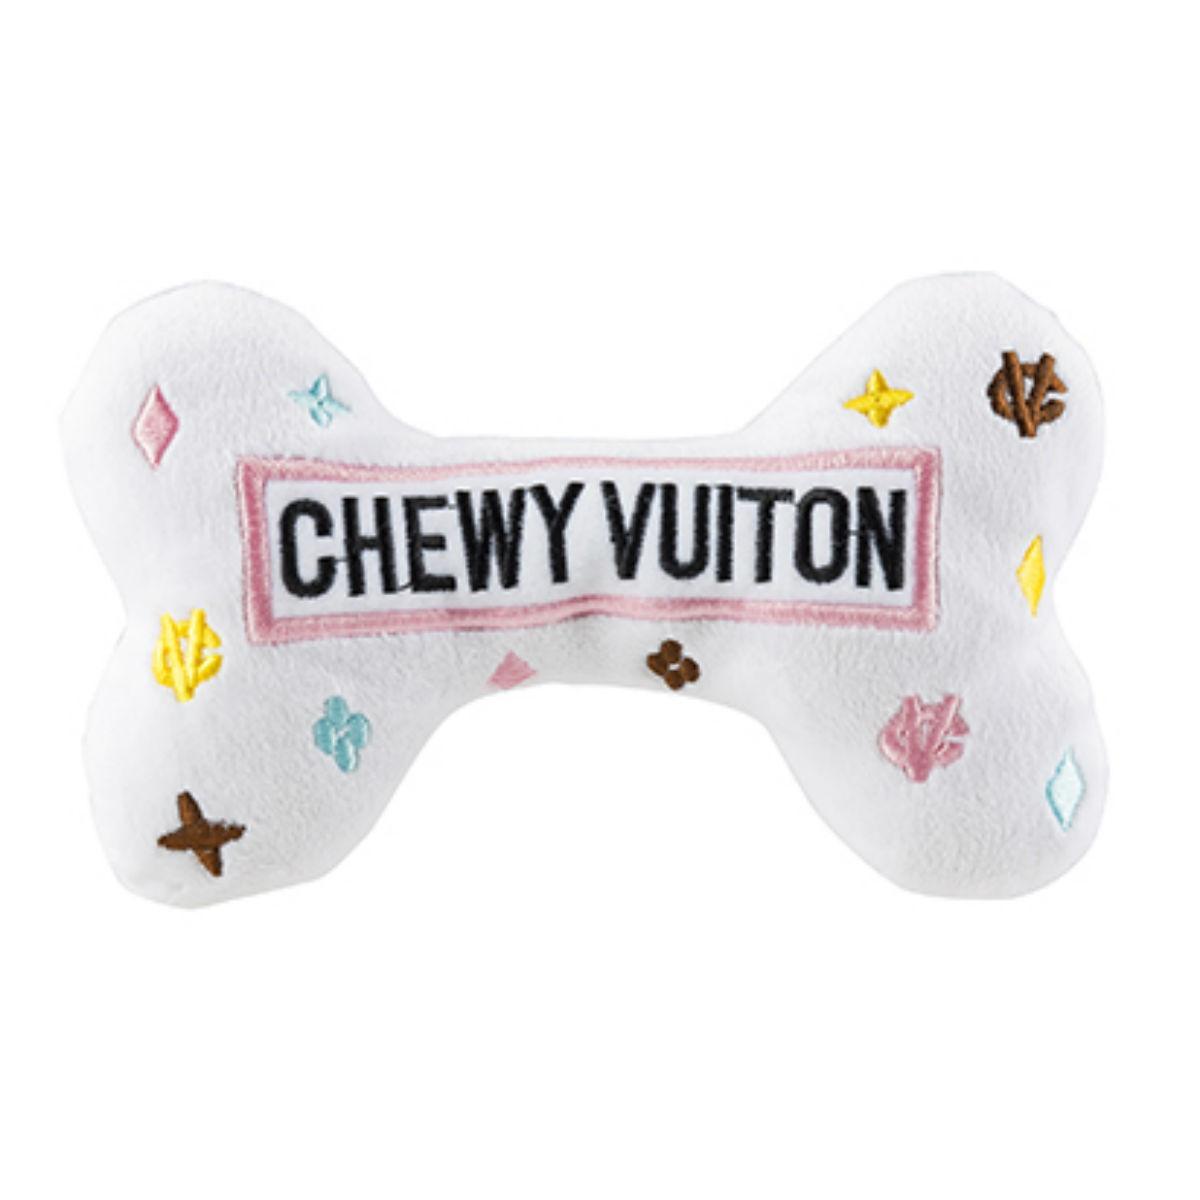 White Chewy Vuiton Bone Dog Toy